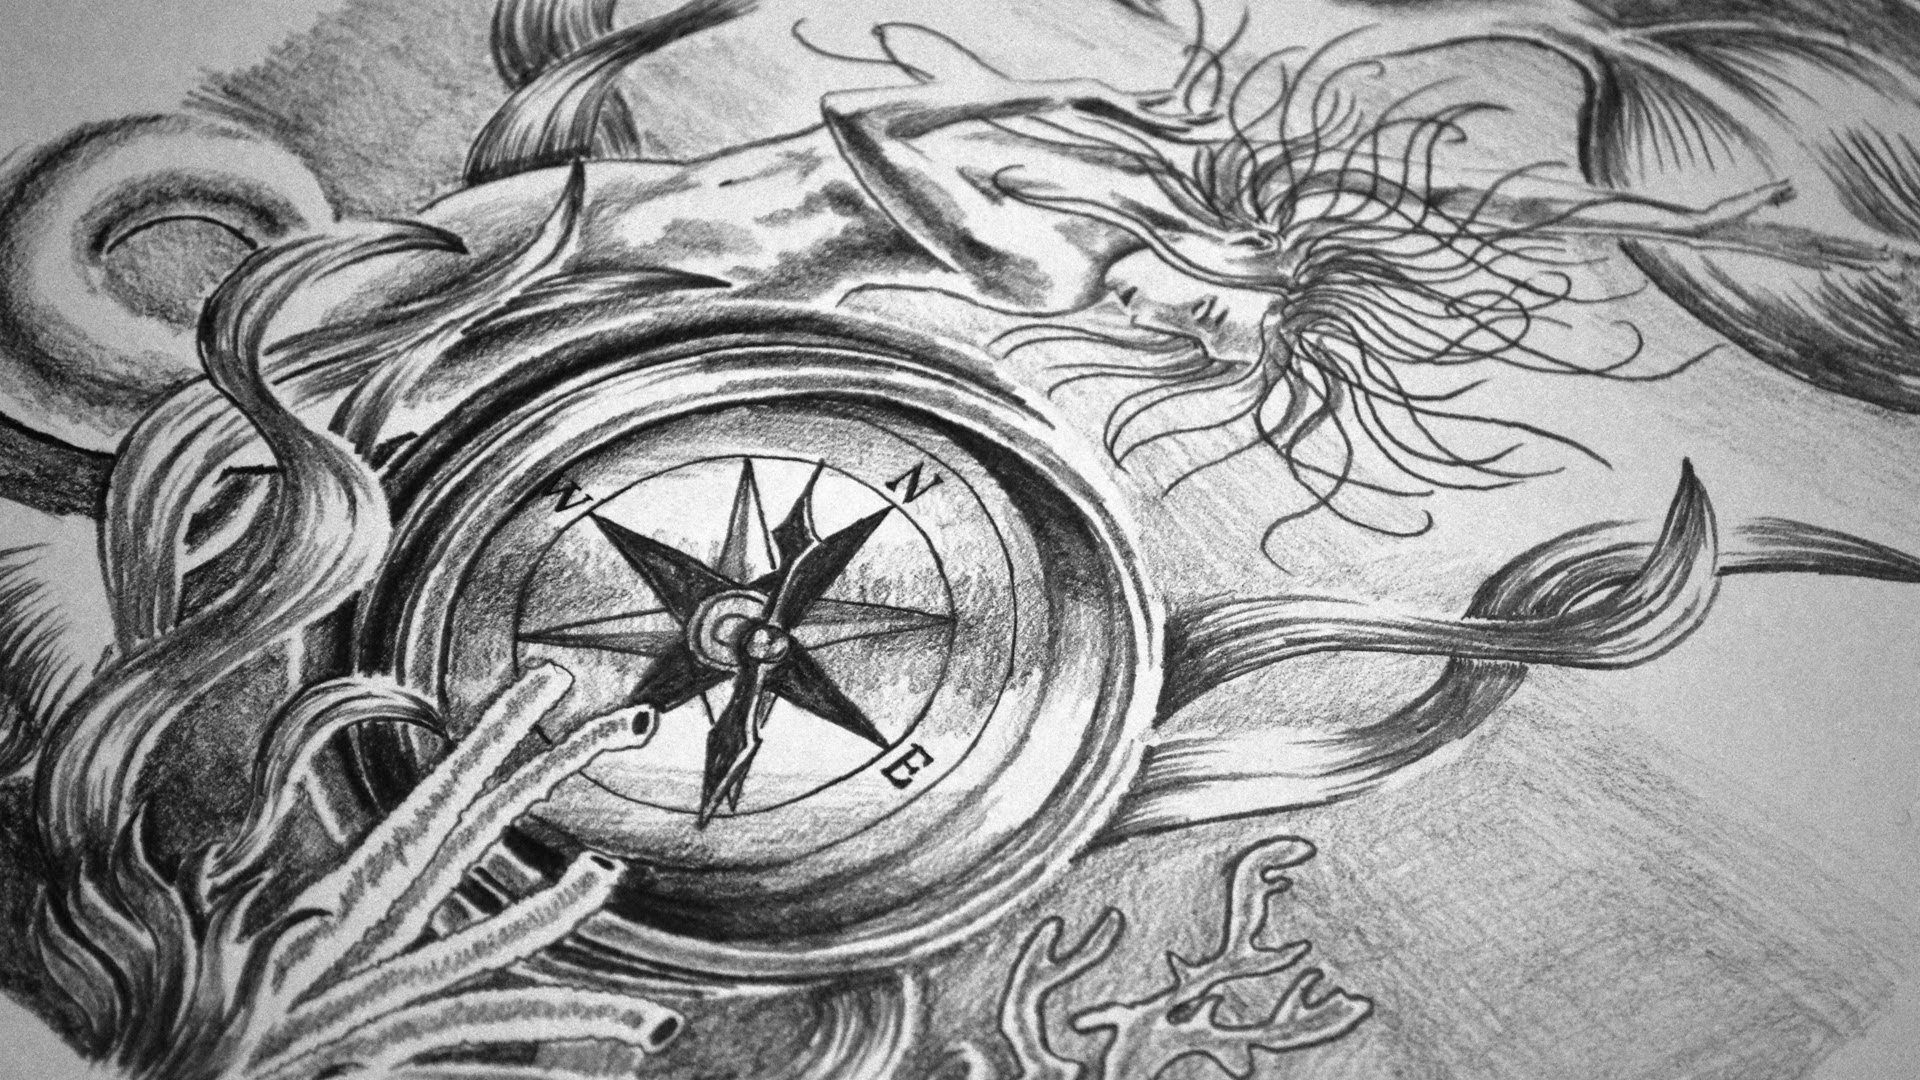 Line Art Tattoo Designs : Watch this artist speed draw a pirate tattoo design «